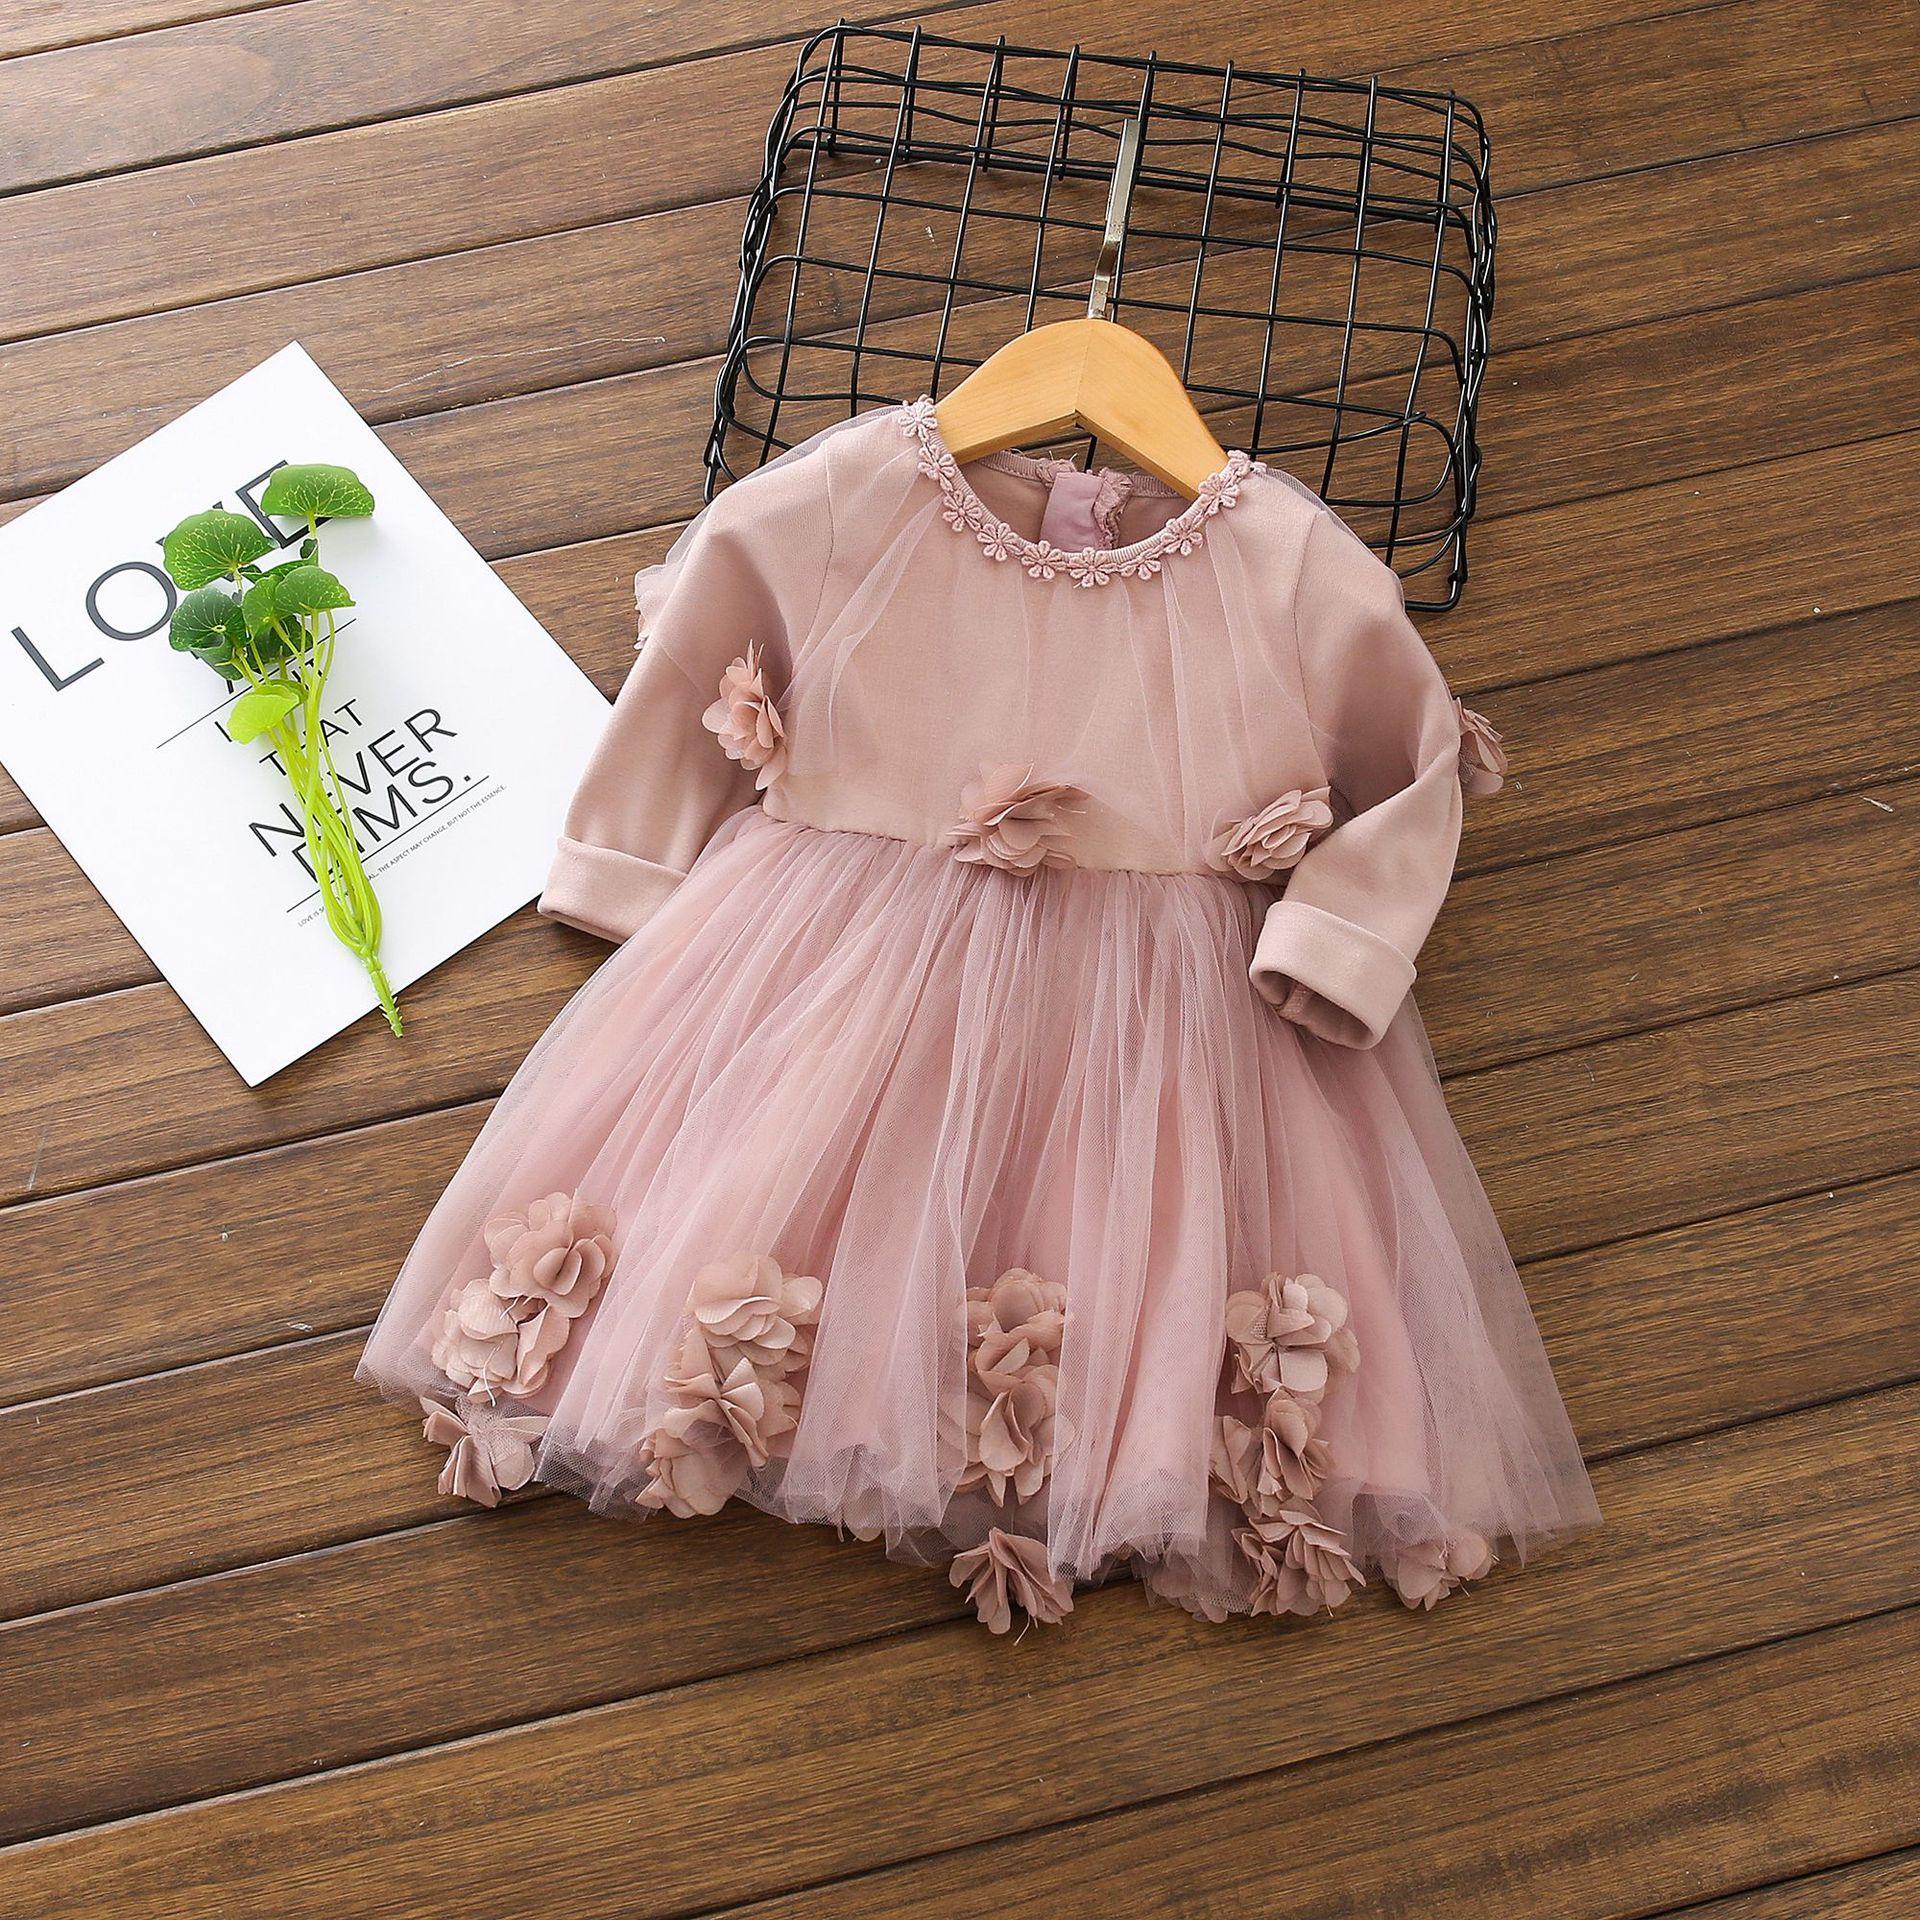 Children's Dress Girls Spring Korean 52 Flower Dresses Pink Princess Dress 1 2 3 YEARS